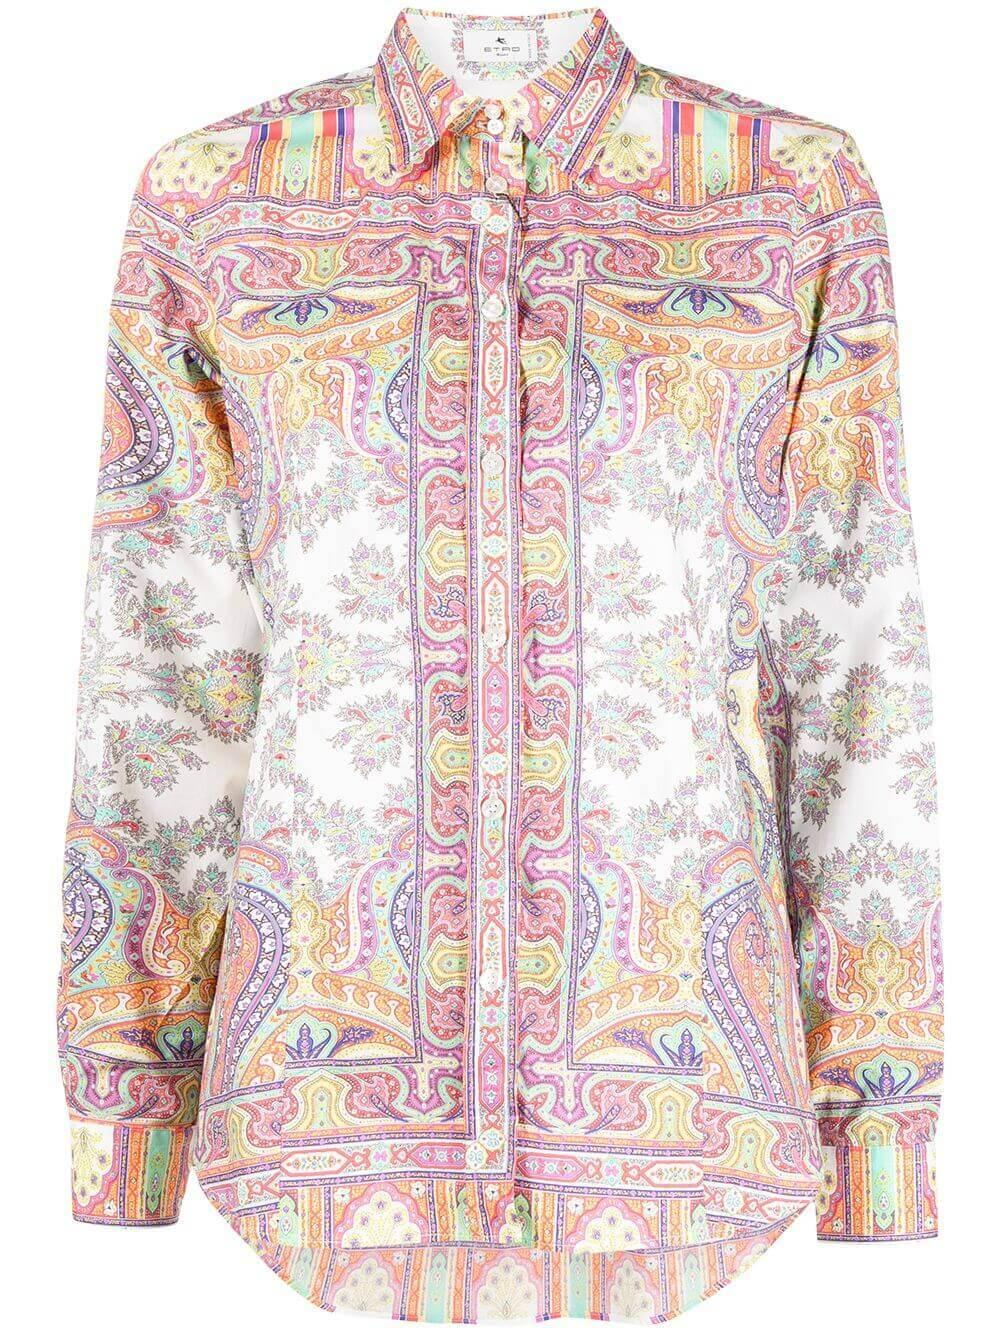 Paisley Print Shirt Item # 211D143014391